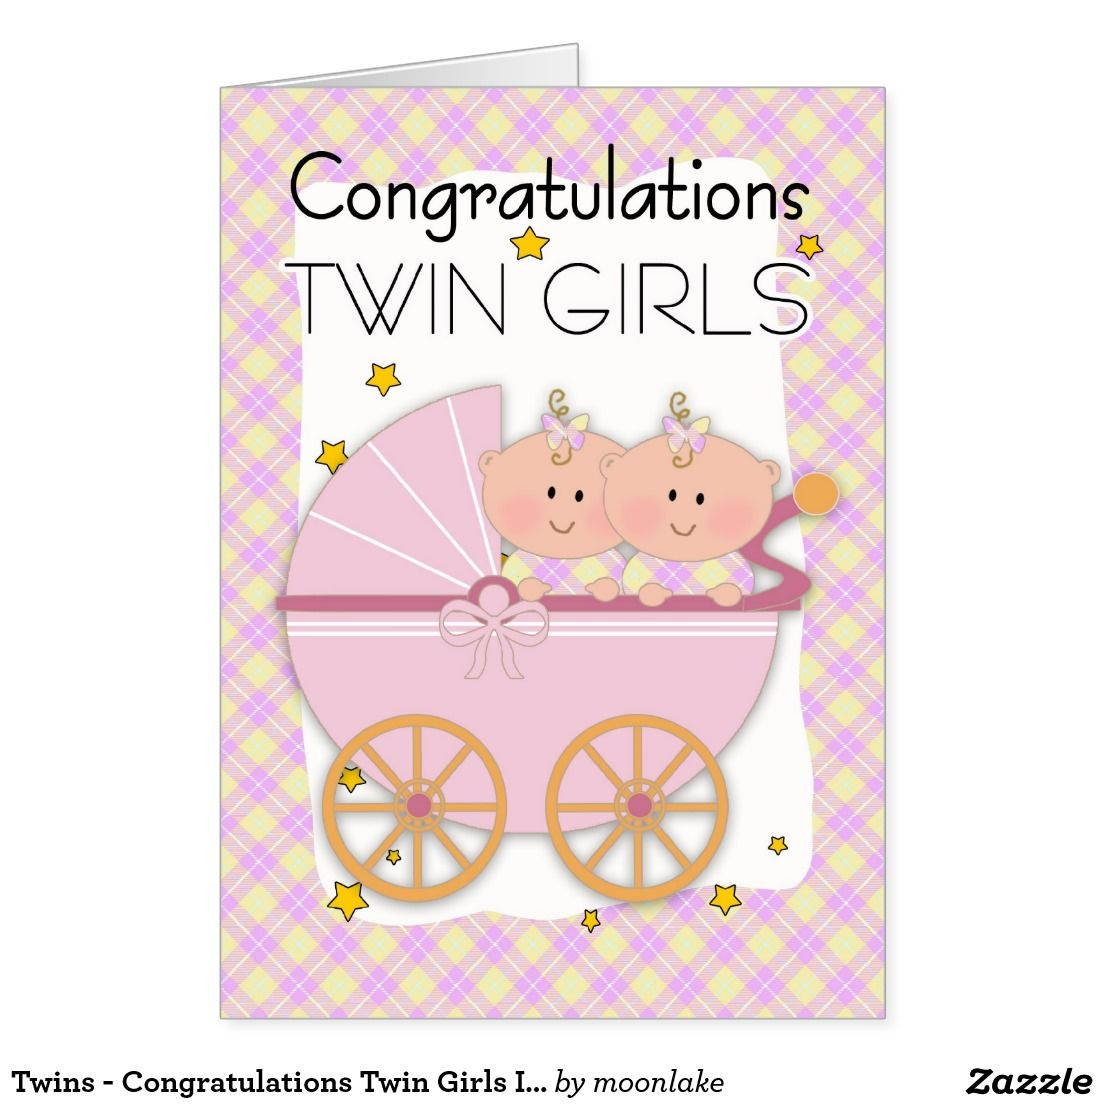 Twins - Congratulations Twin Girls In A Pram